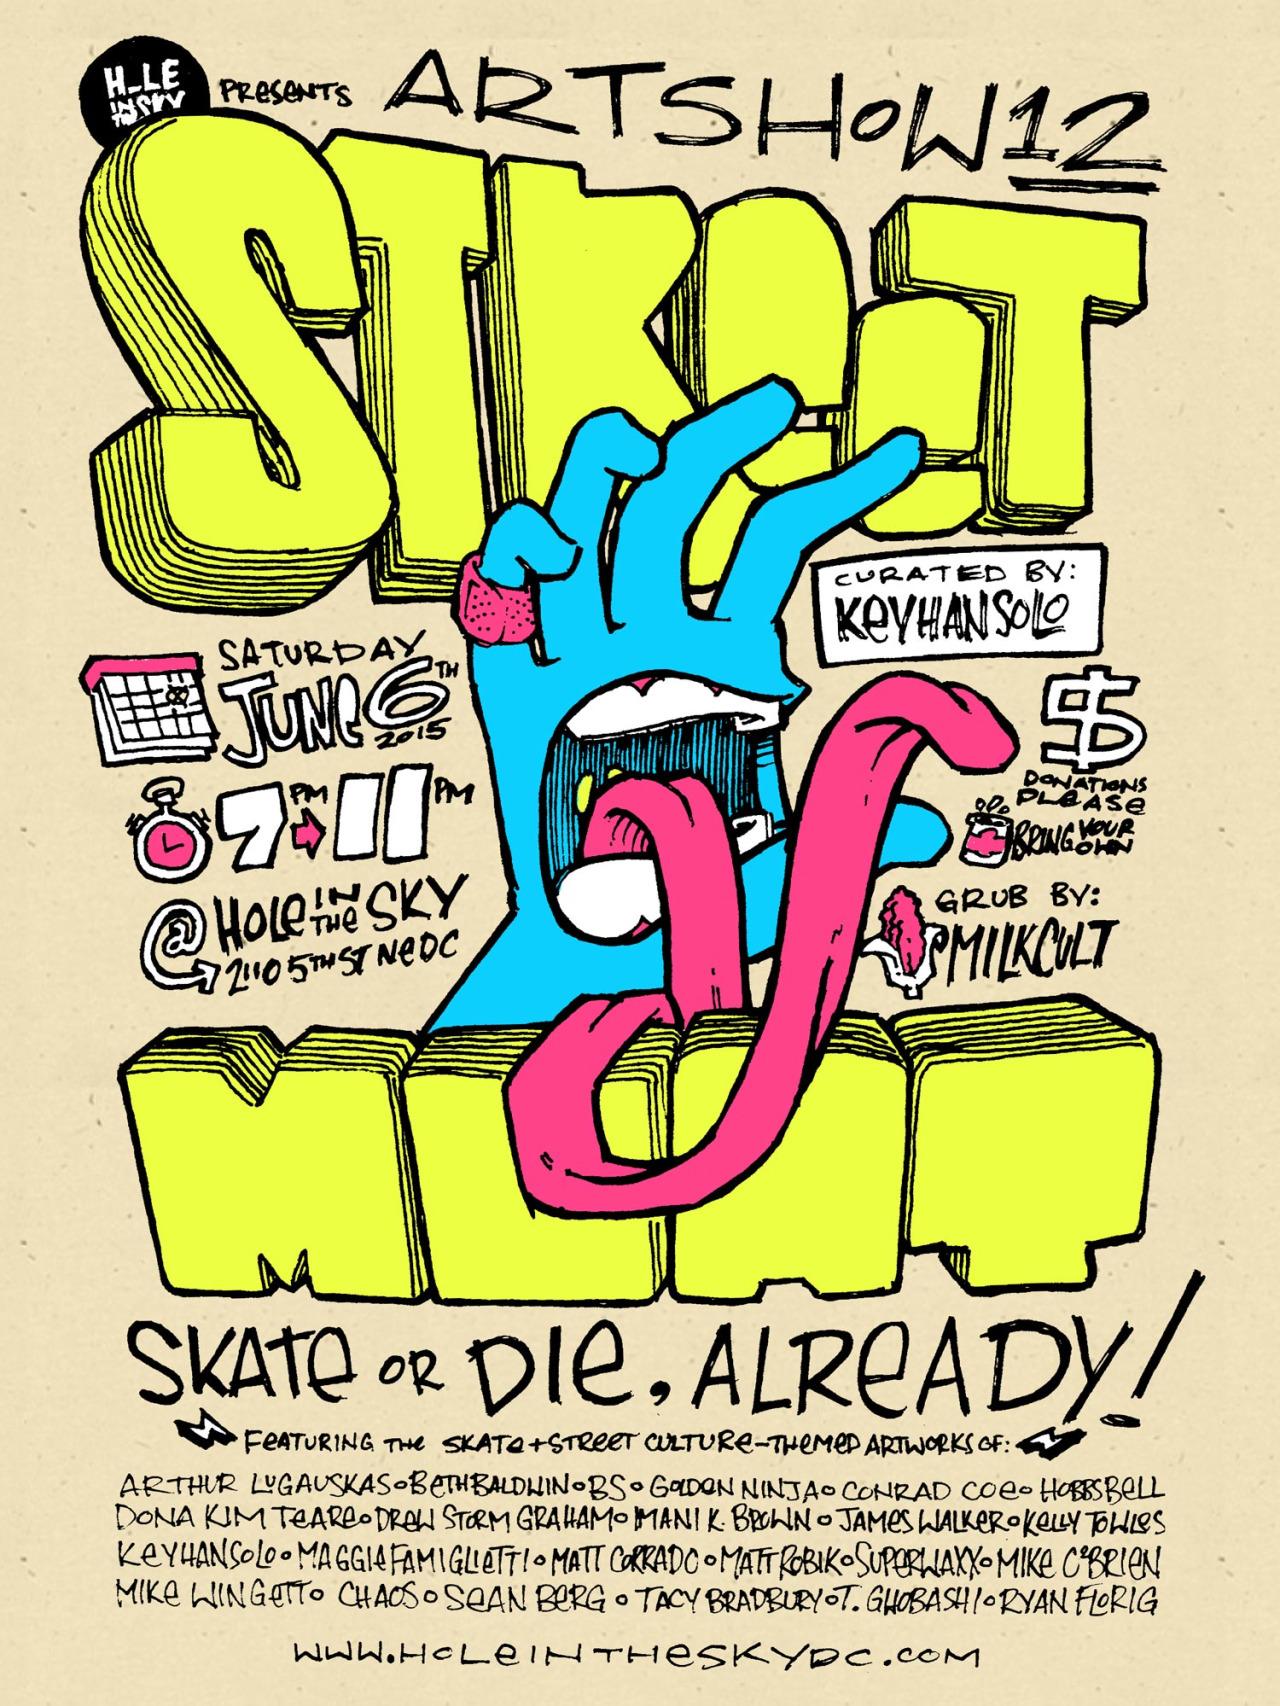 H_LE IN THE SKY - ART SHOW 12 - STREET MEAT - SKATE OR DIE, ALREADY!.jpg